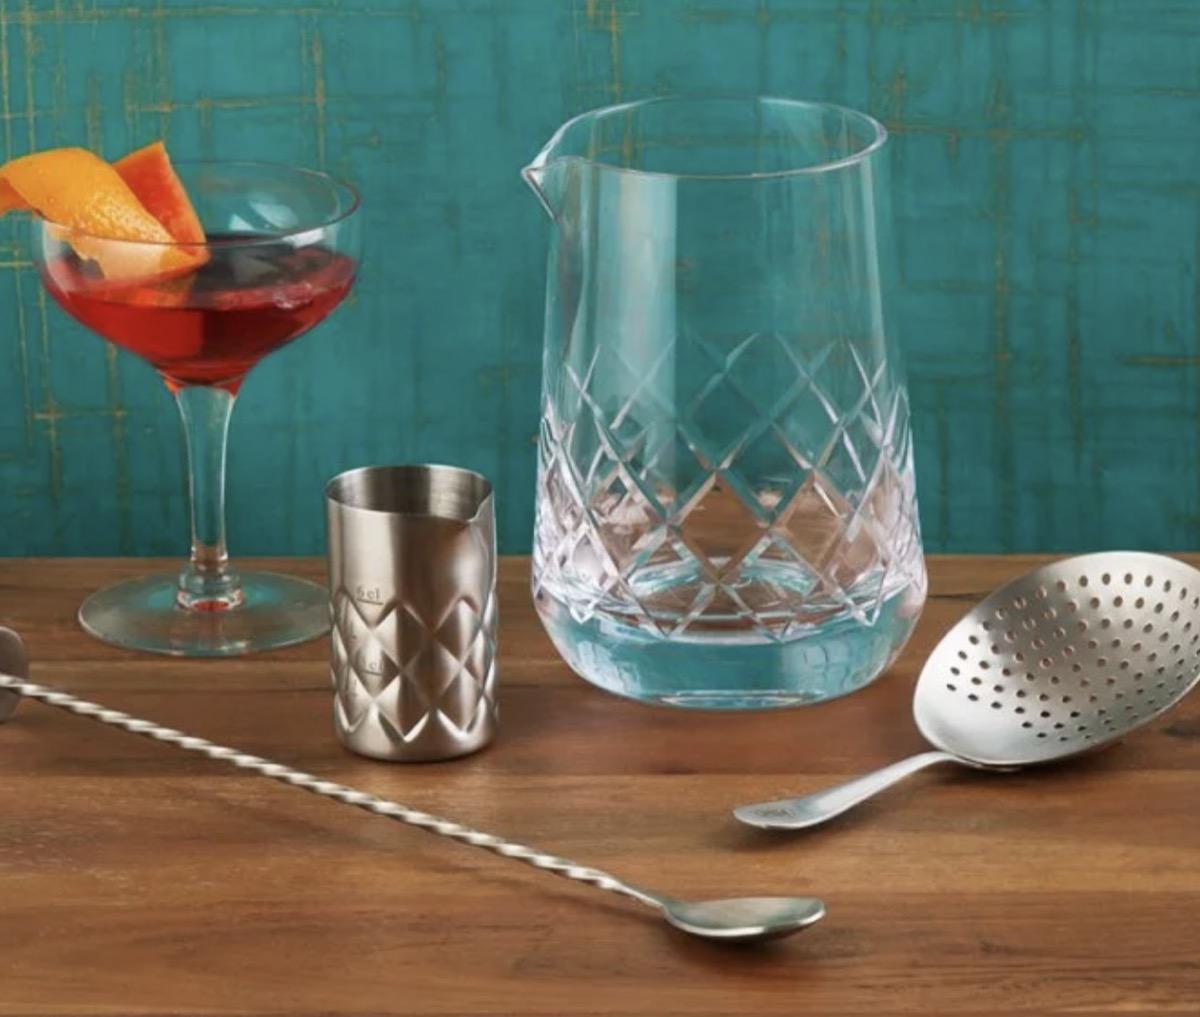 cokctail mixing glasses gift set